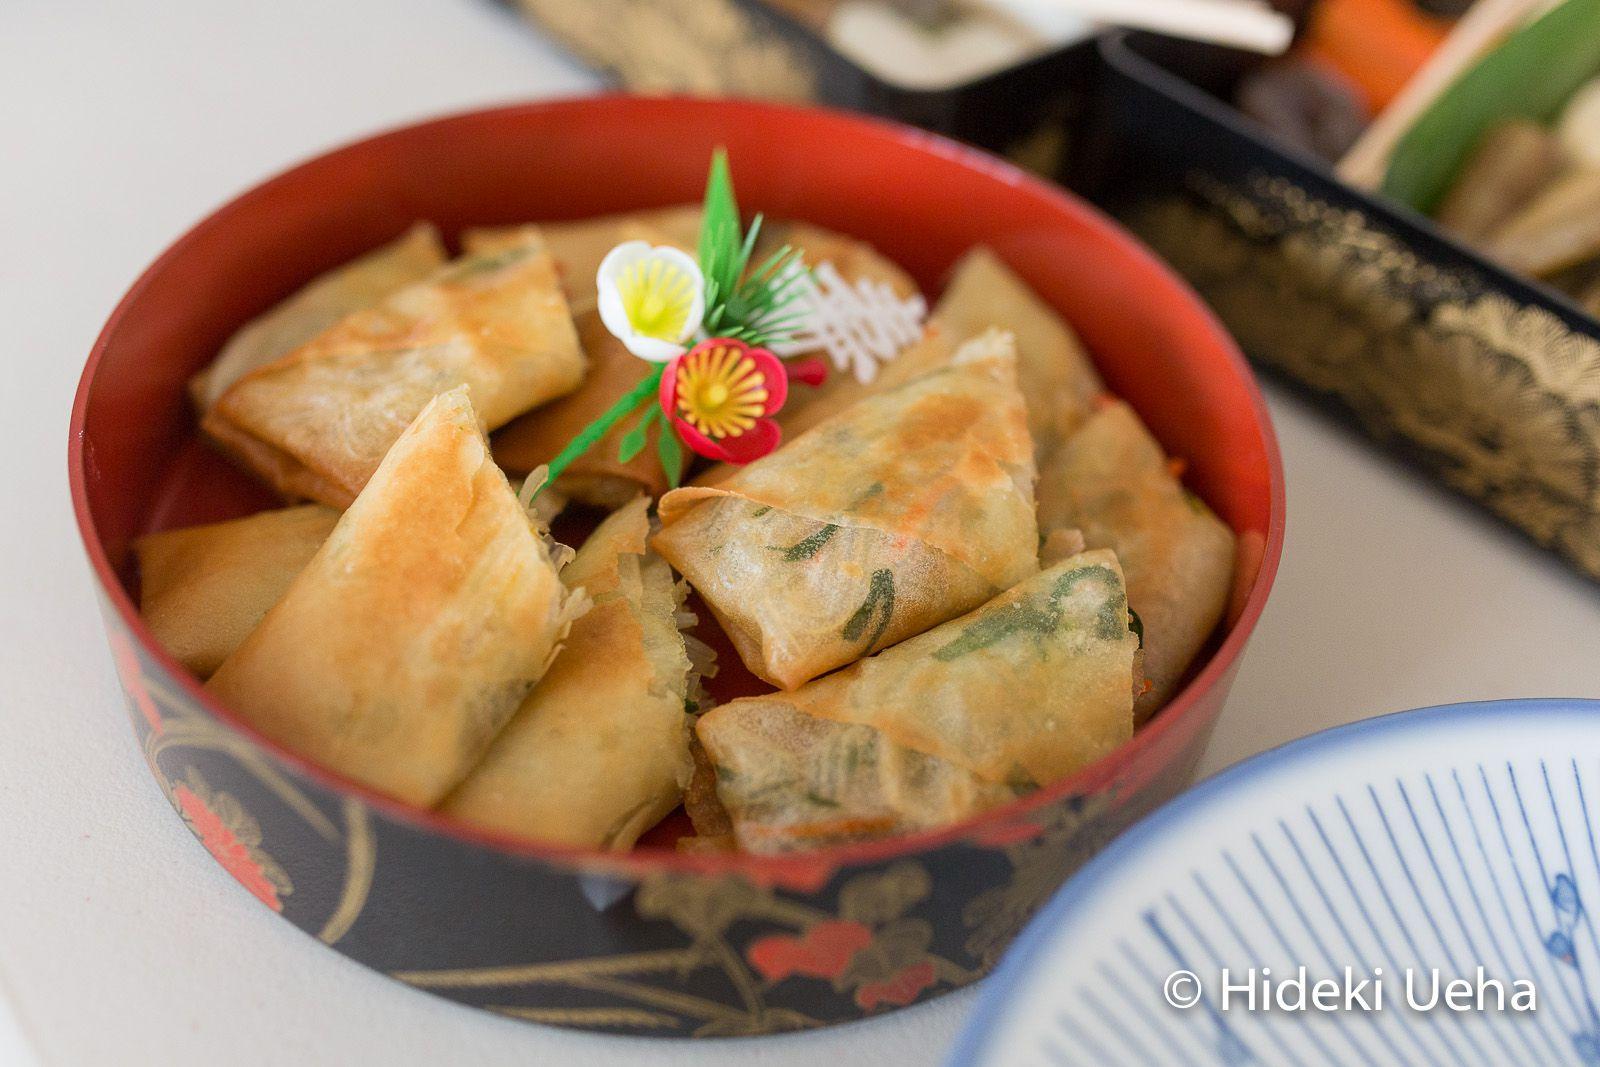 Vegetable Harumaki Fried Spring Roll Recipe